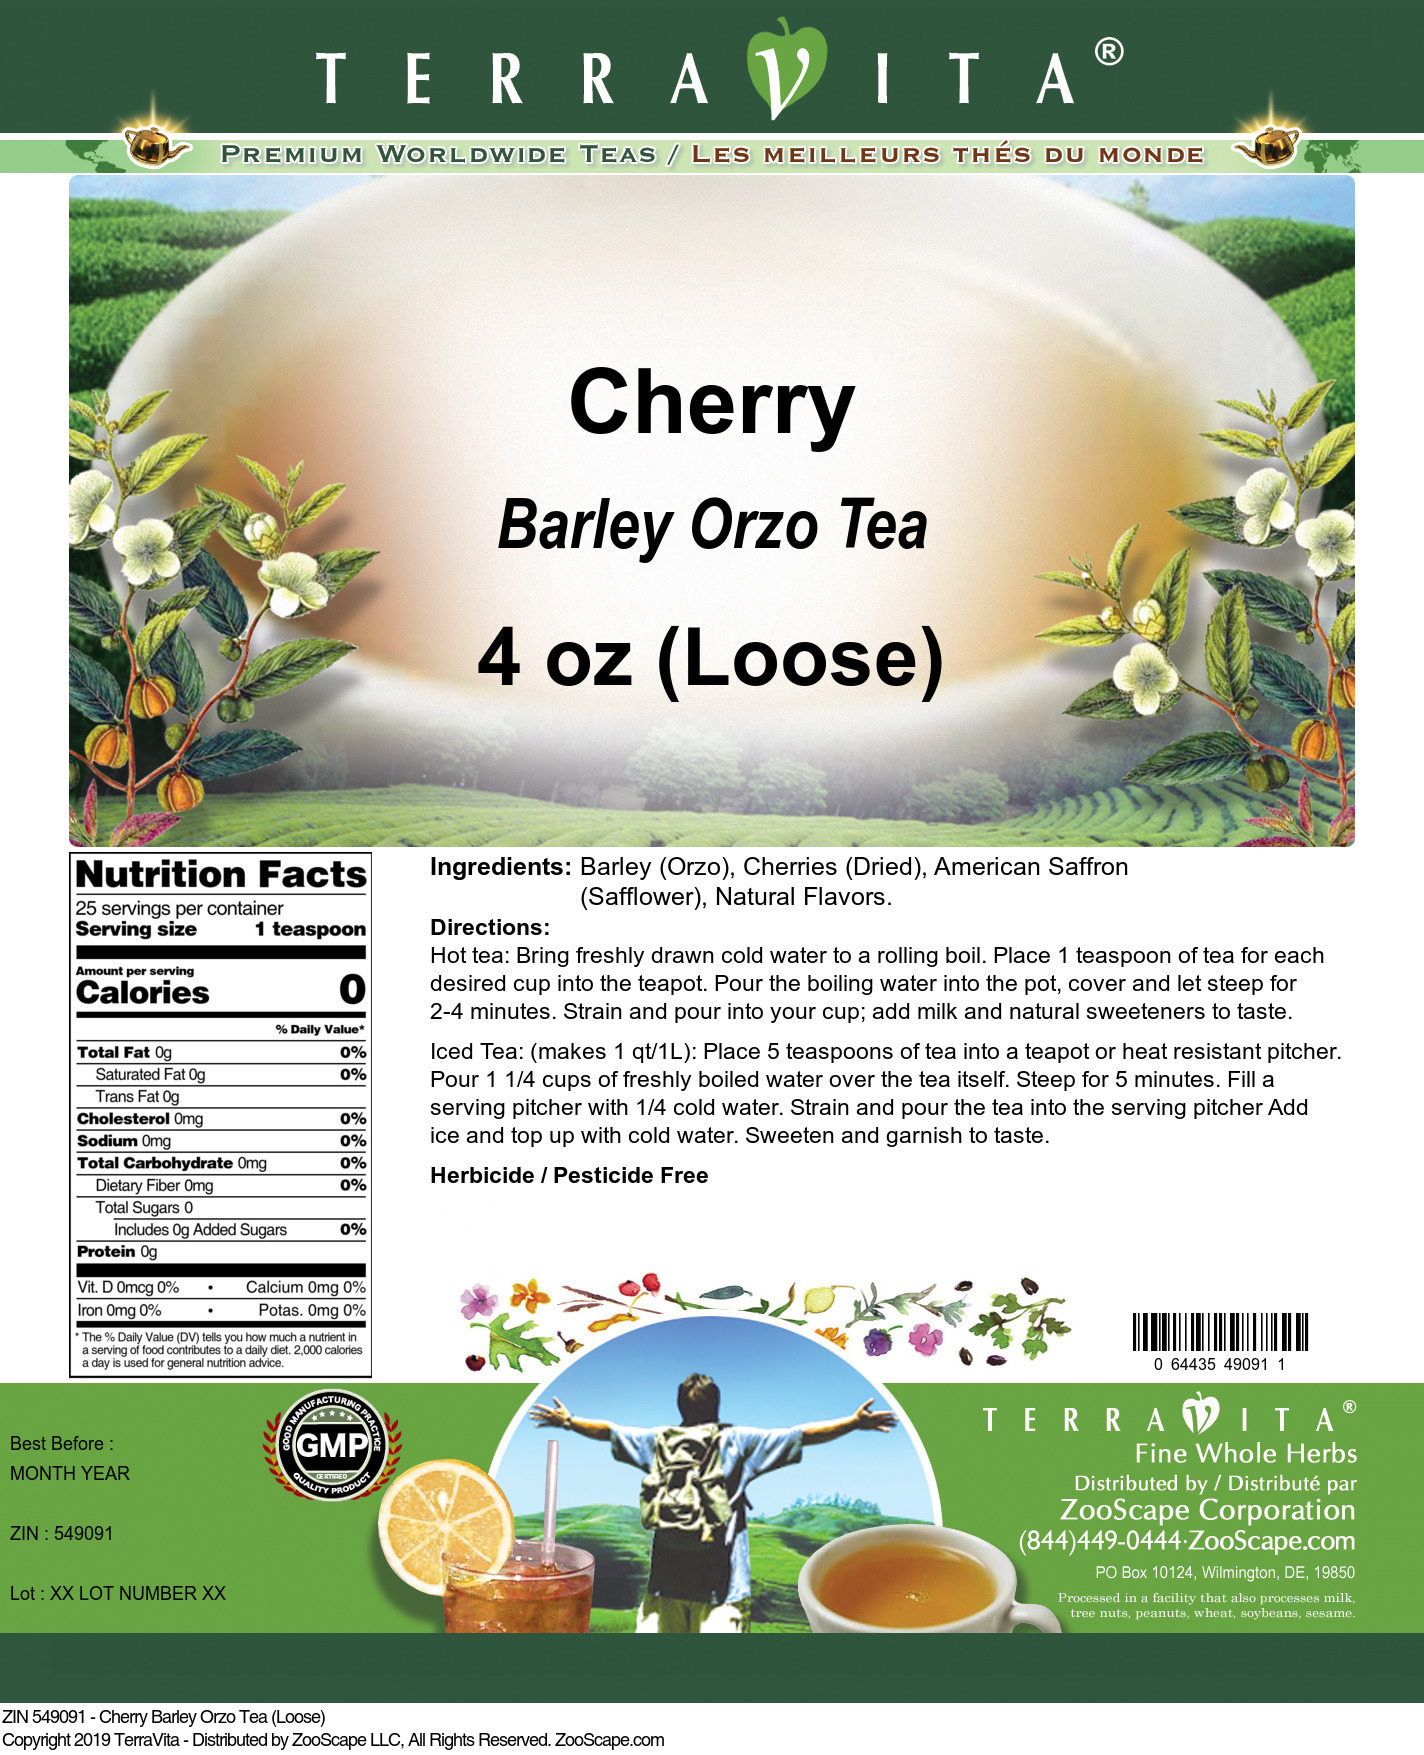 Cherry Barley Orzo